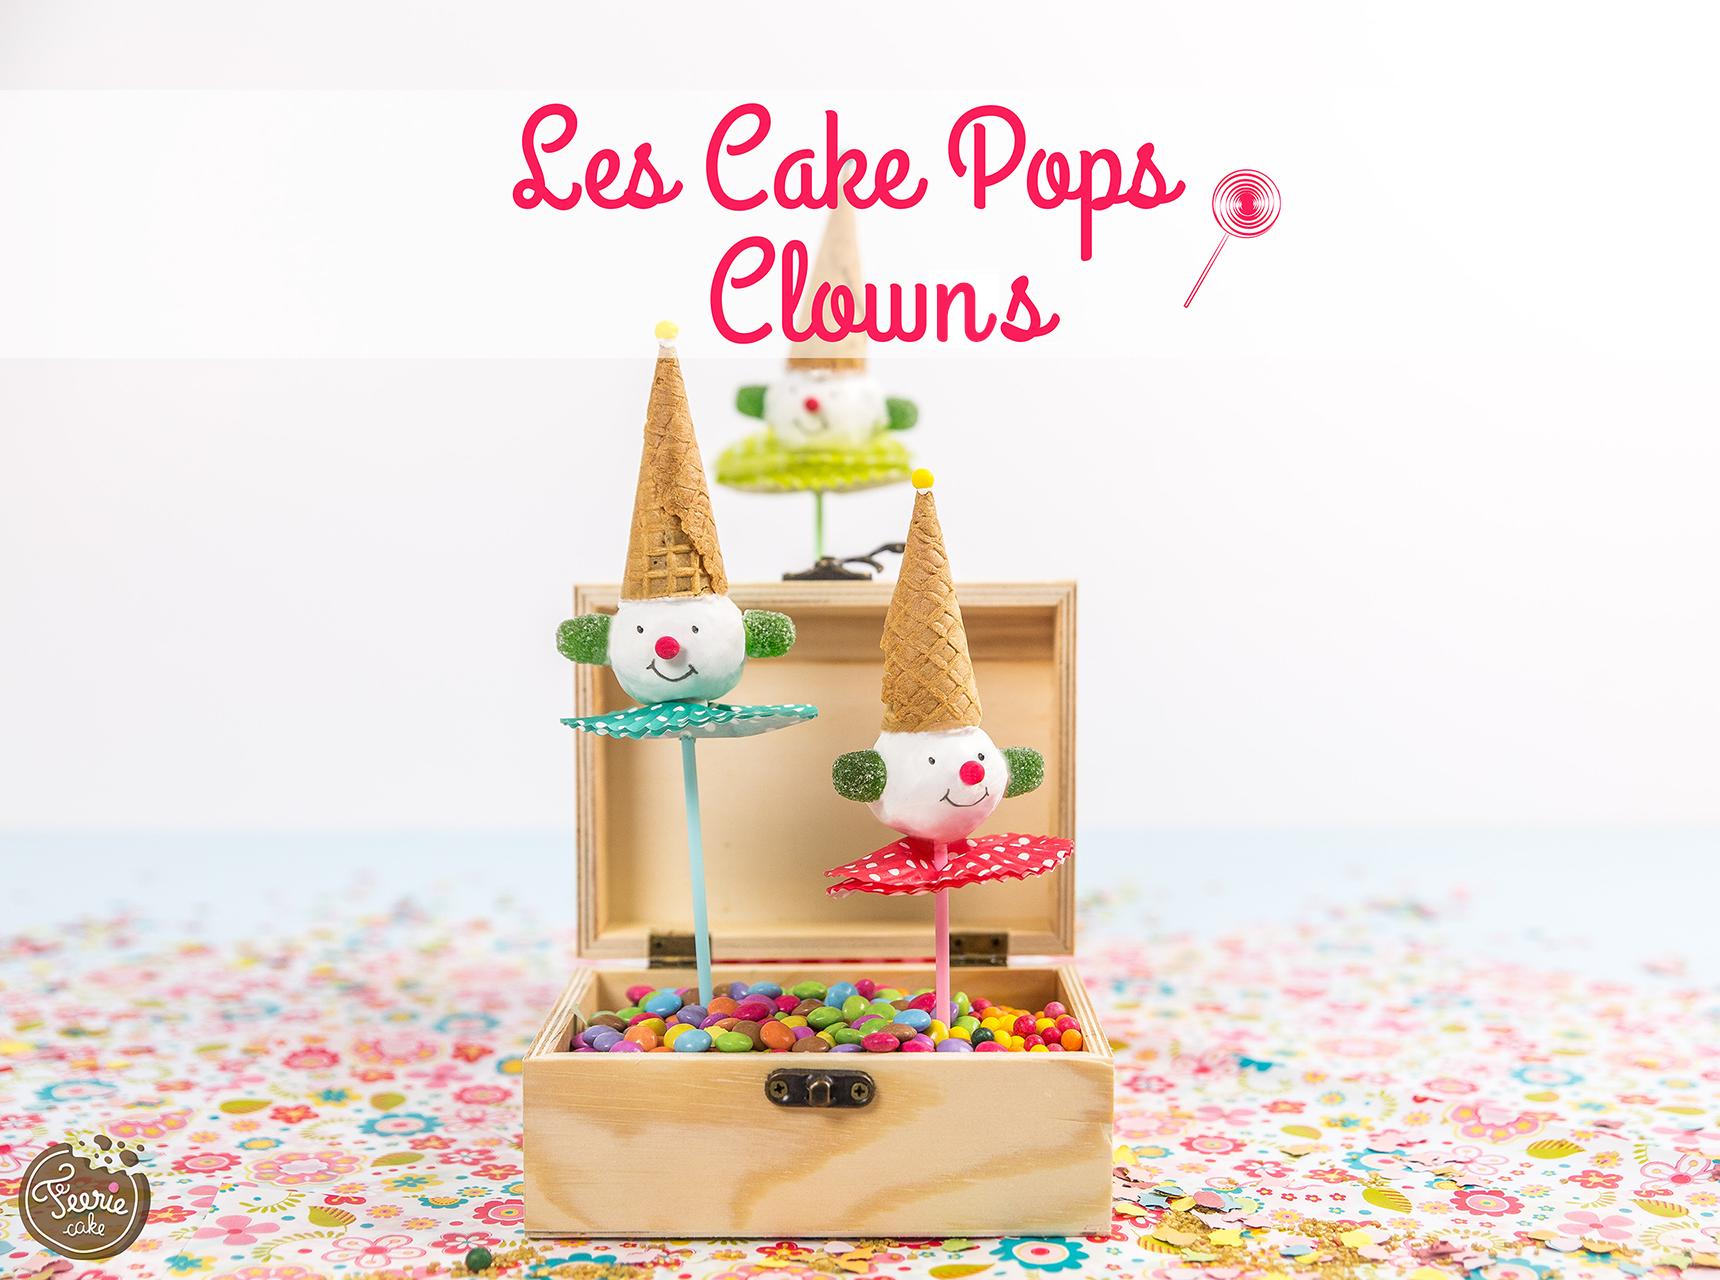 Candy Melt Pour Cake Pops